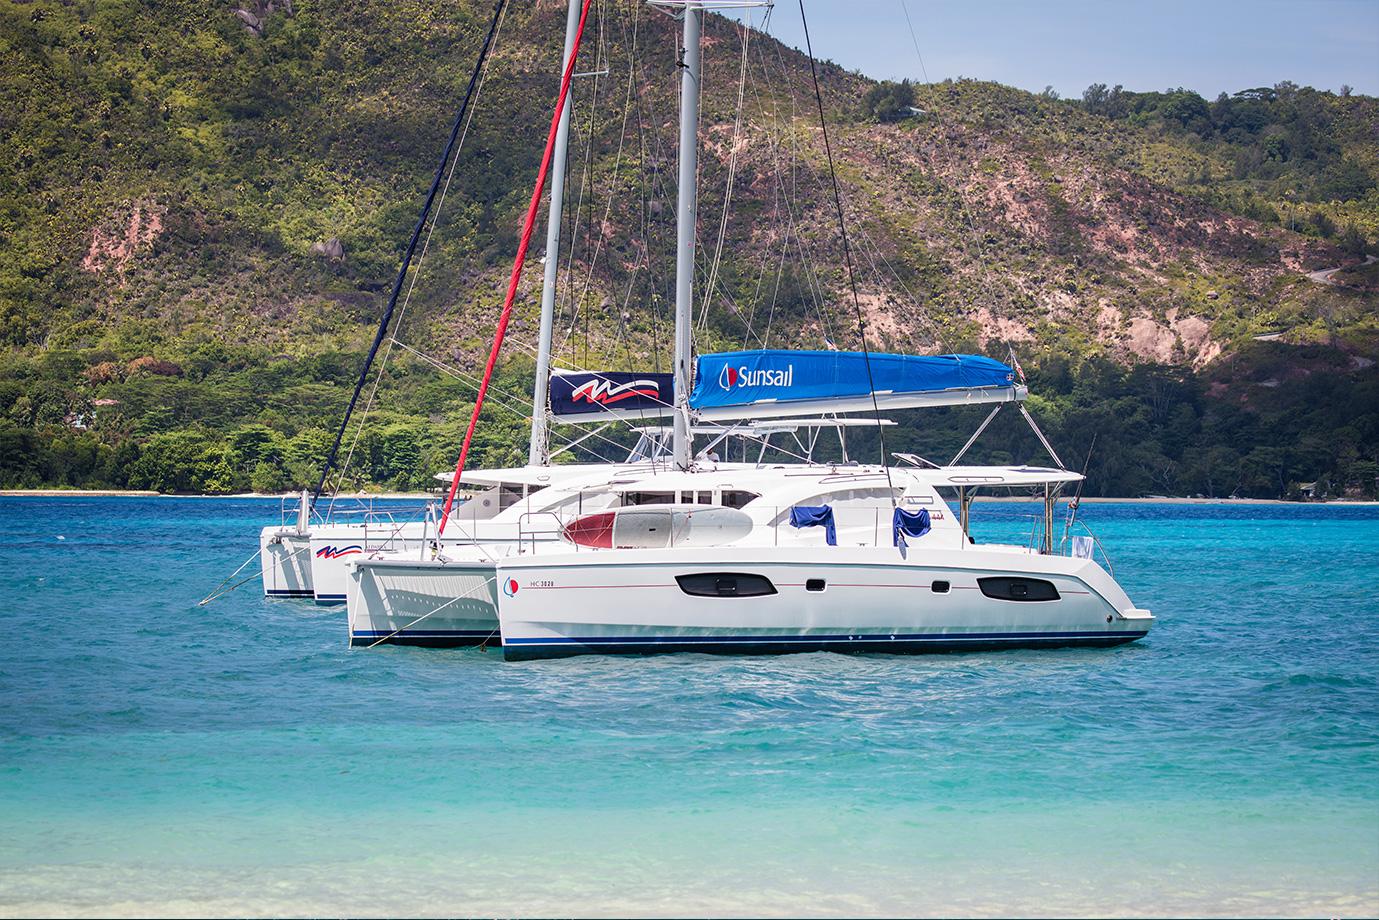 sunsail-seychelles